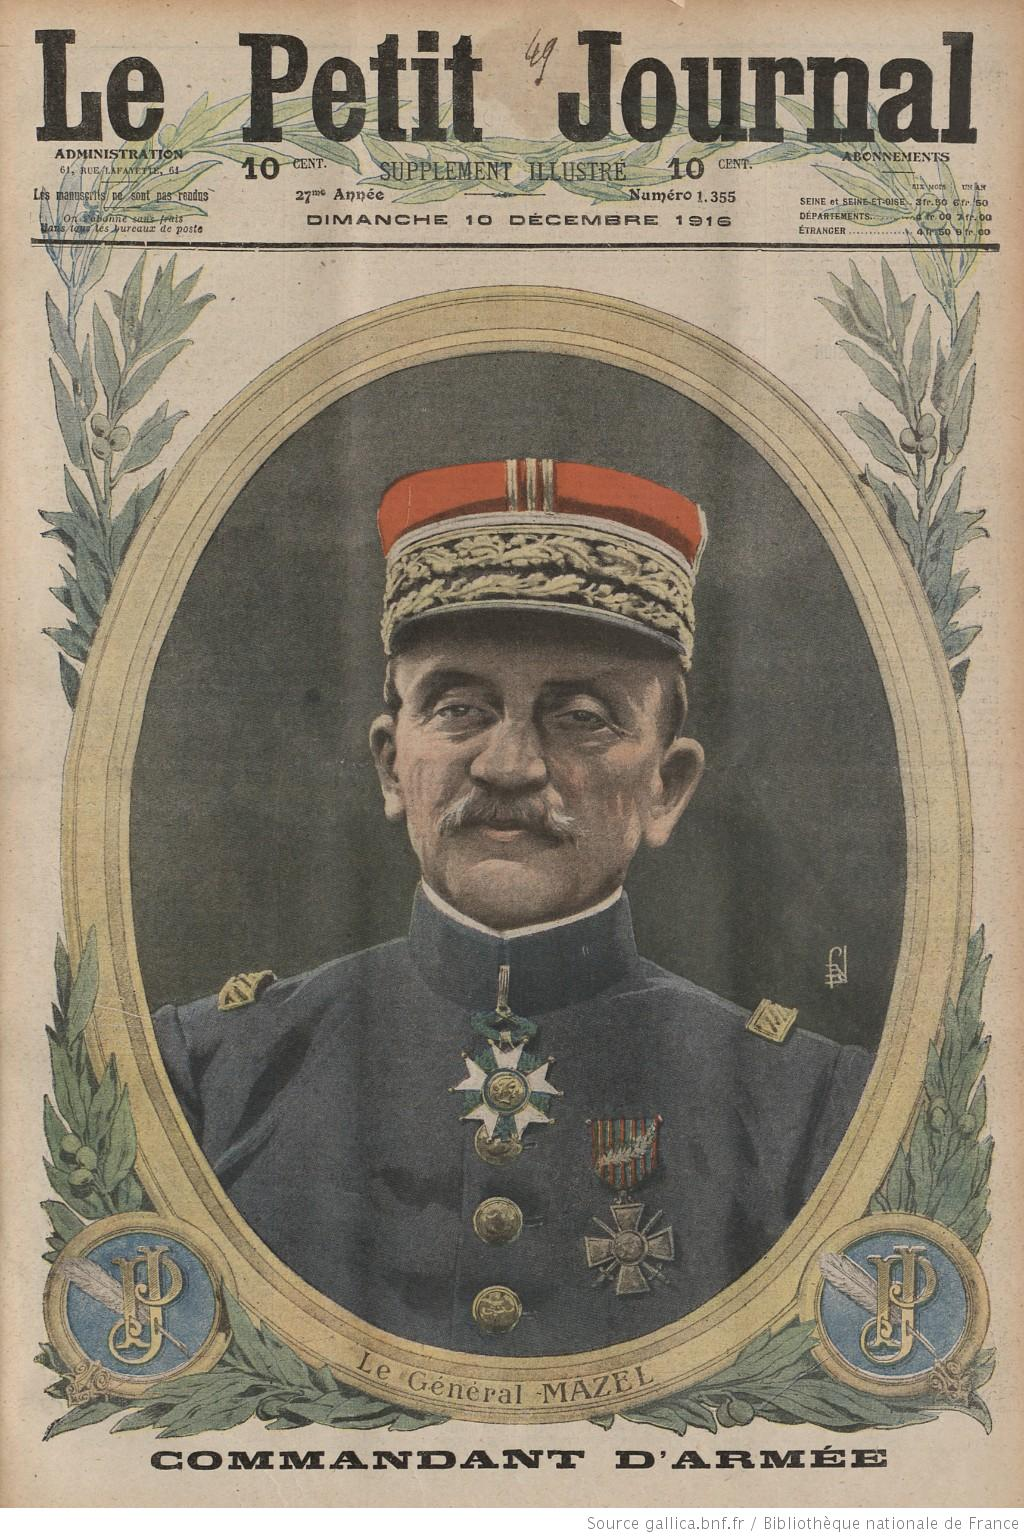 LPJ Illustre 1916-12-10 A.jpg